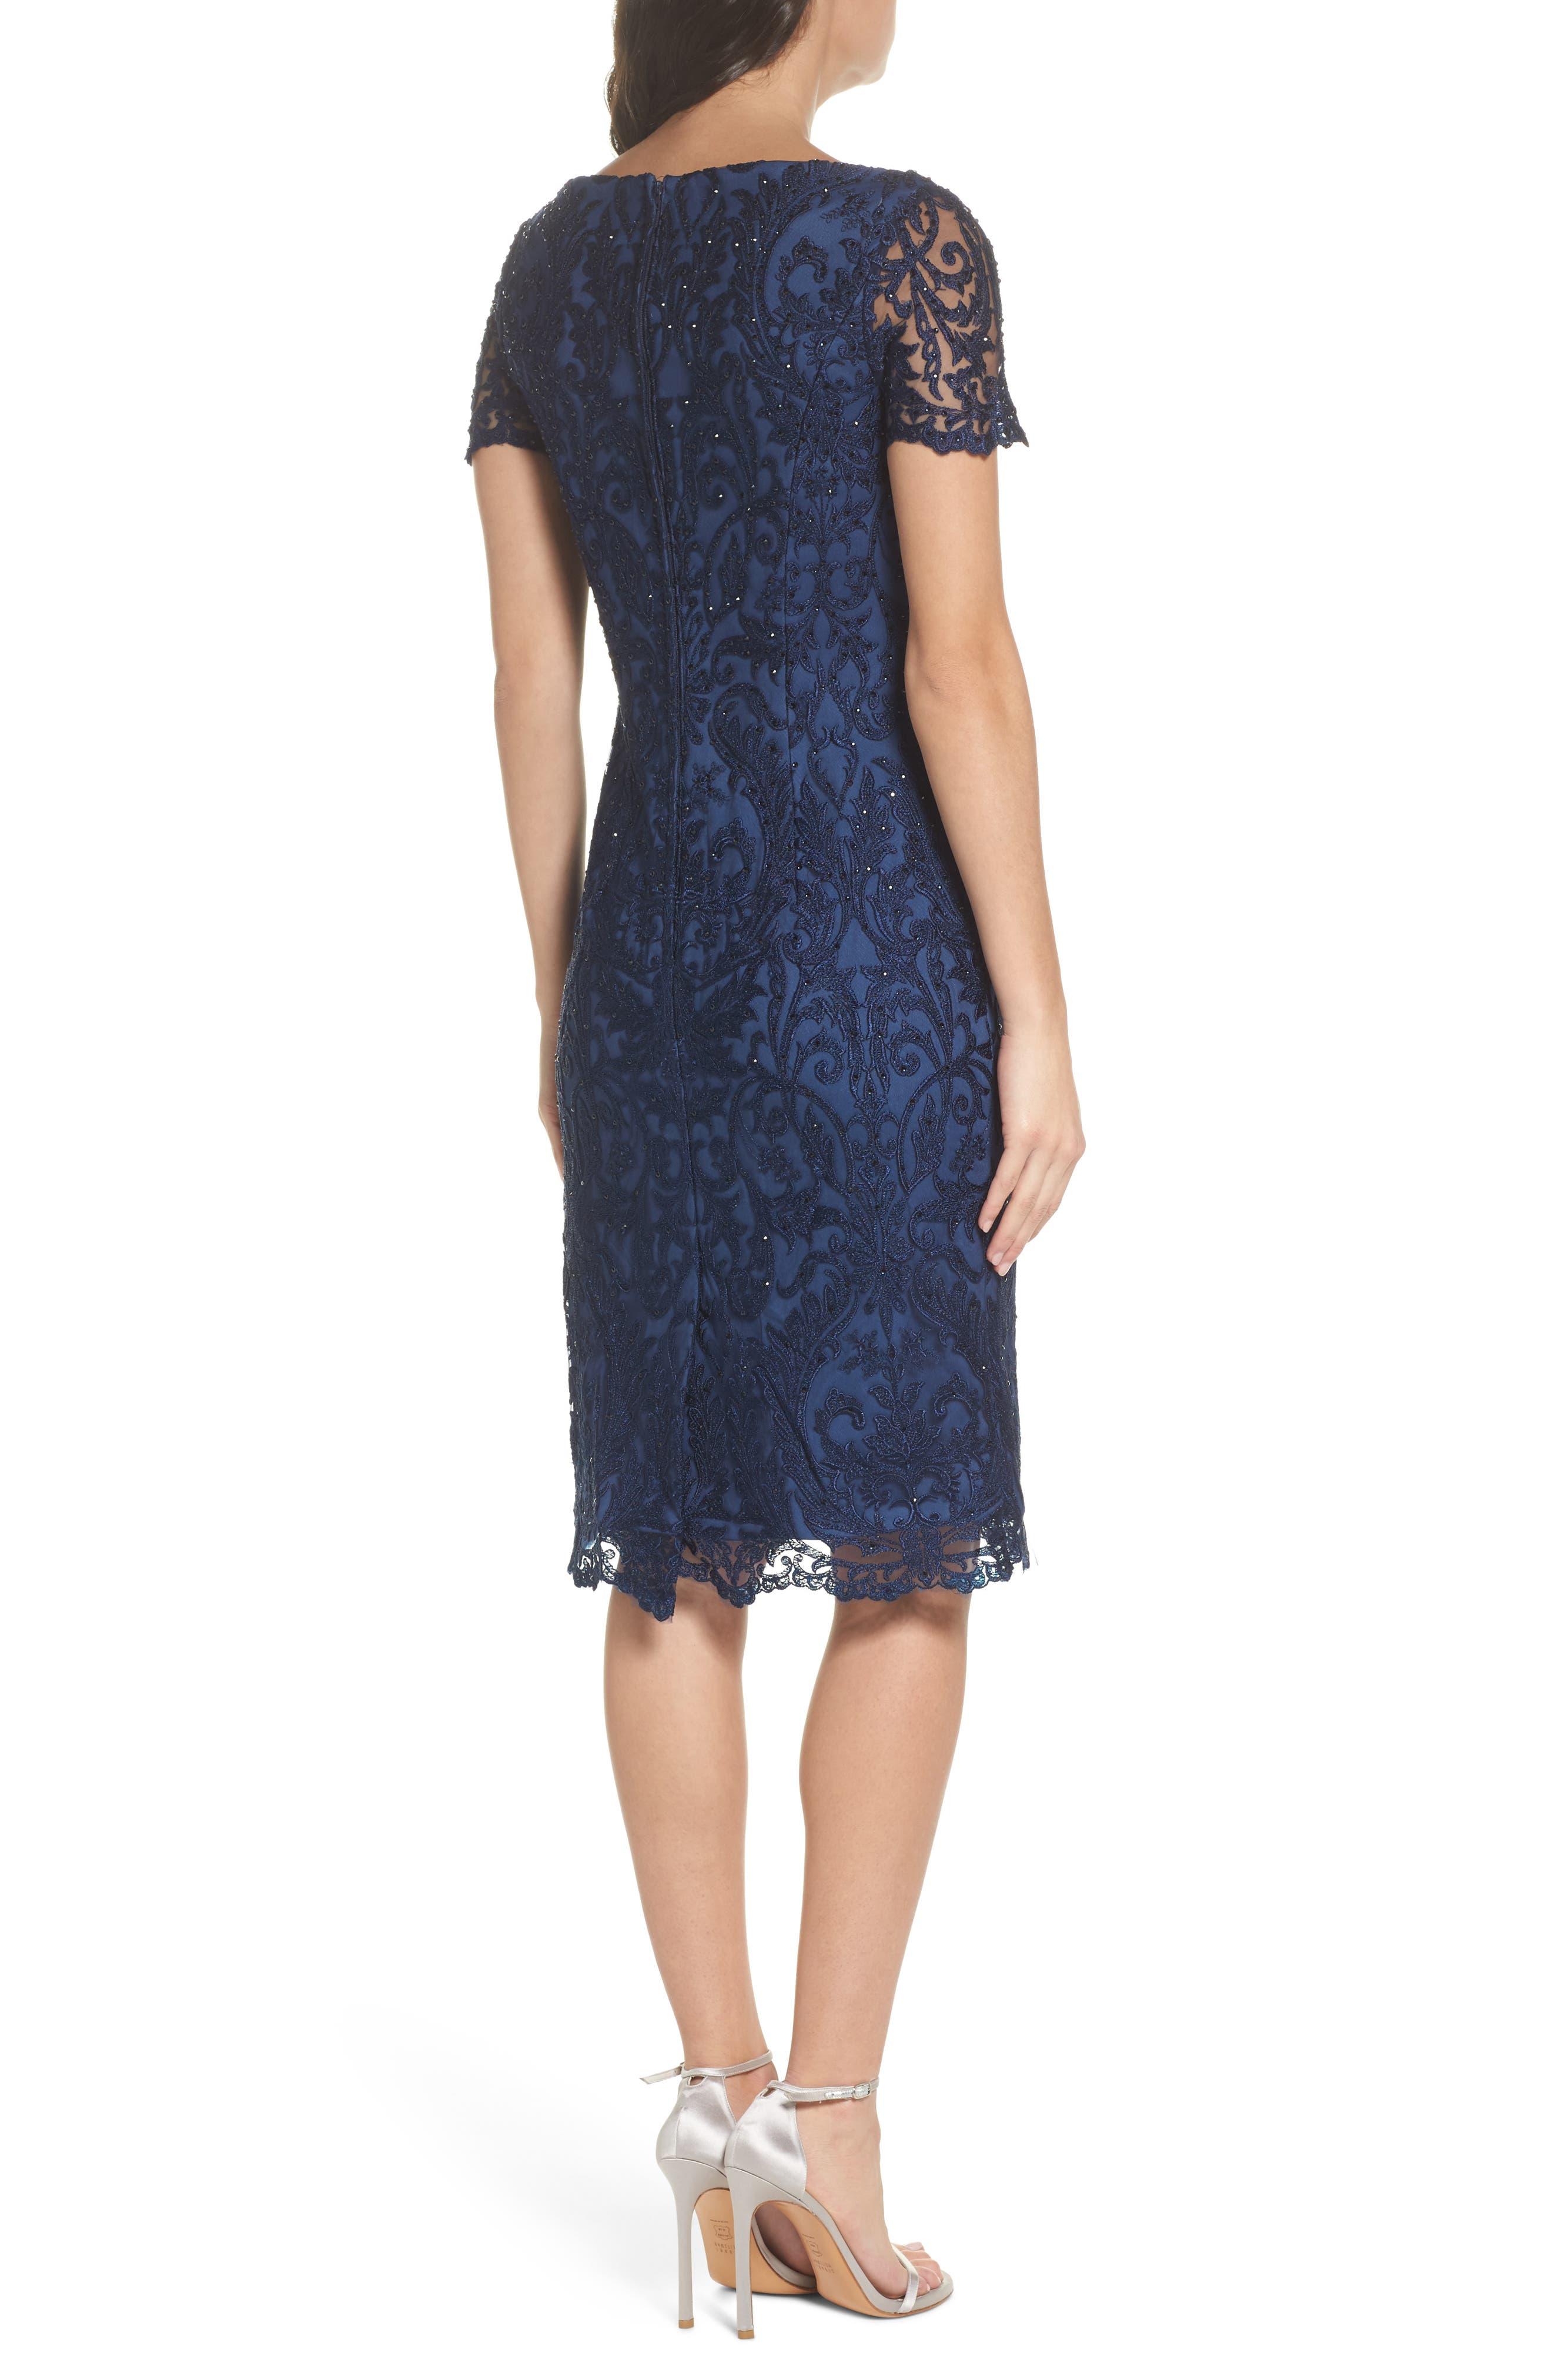 LA FEMME, Beaded Lace Sheath Dress, Alternate thumbnail 2, color, SLATE BLUE